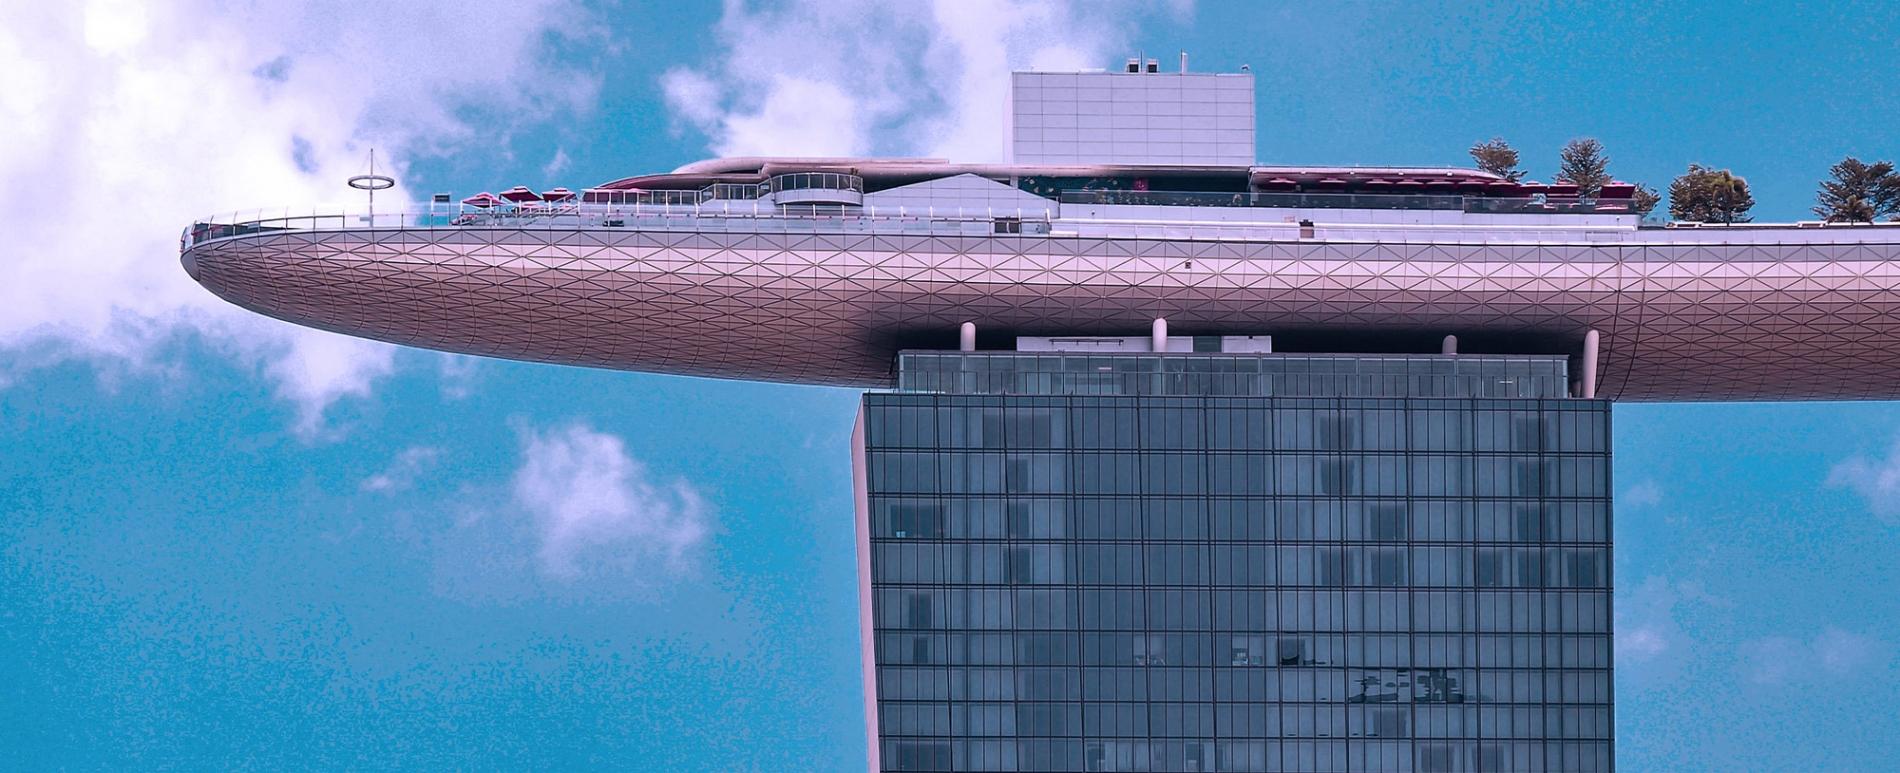 A terrace atop a hotel building